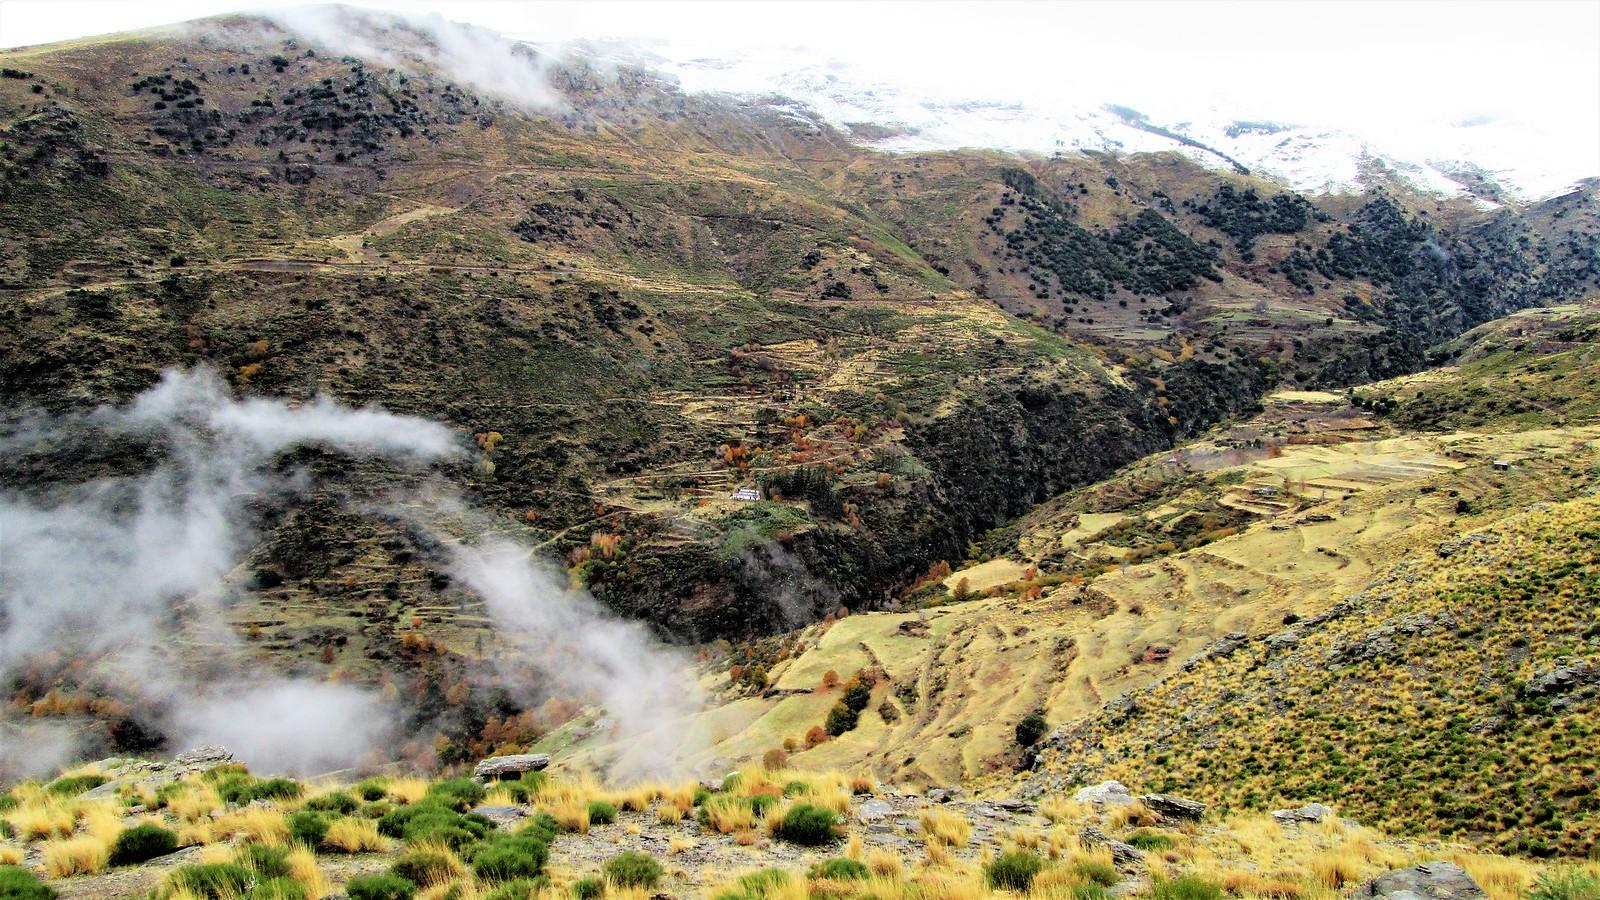 Valle de Lanjarón